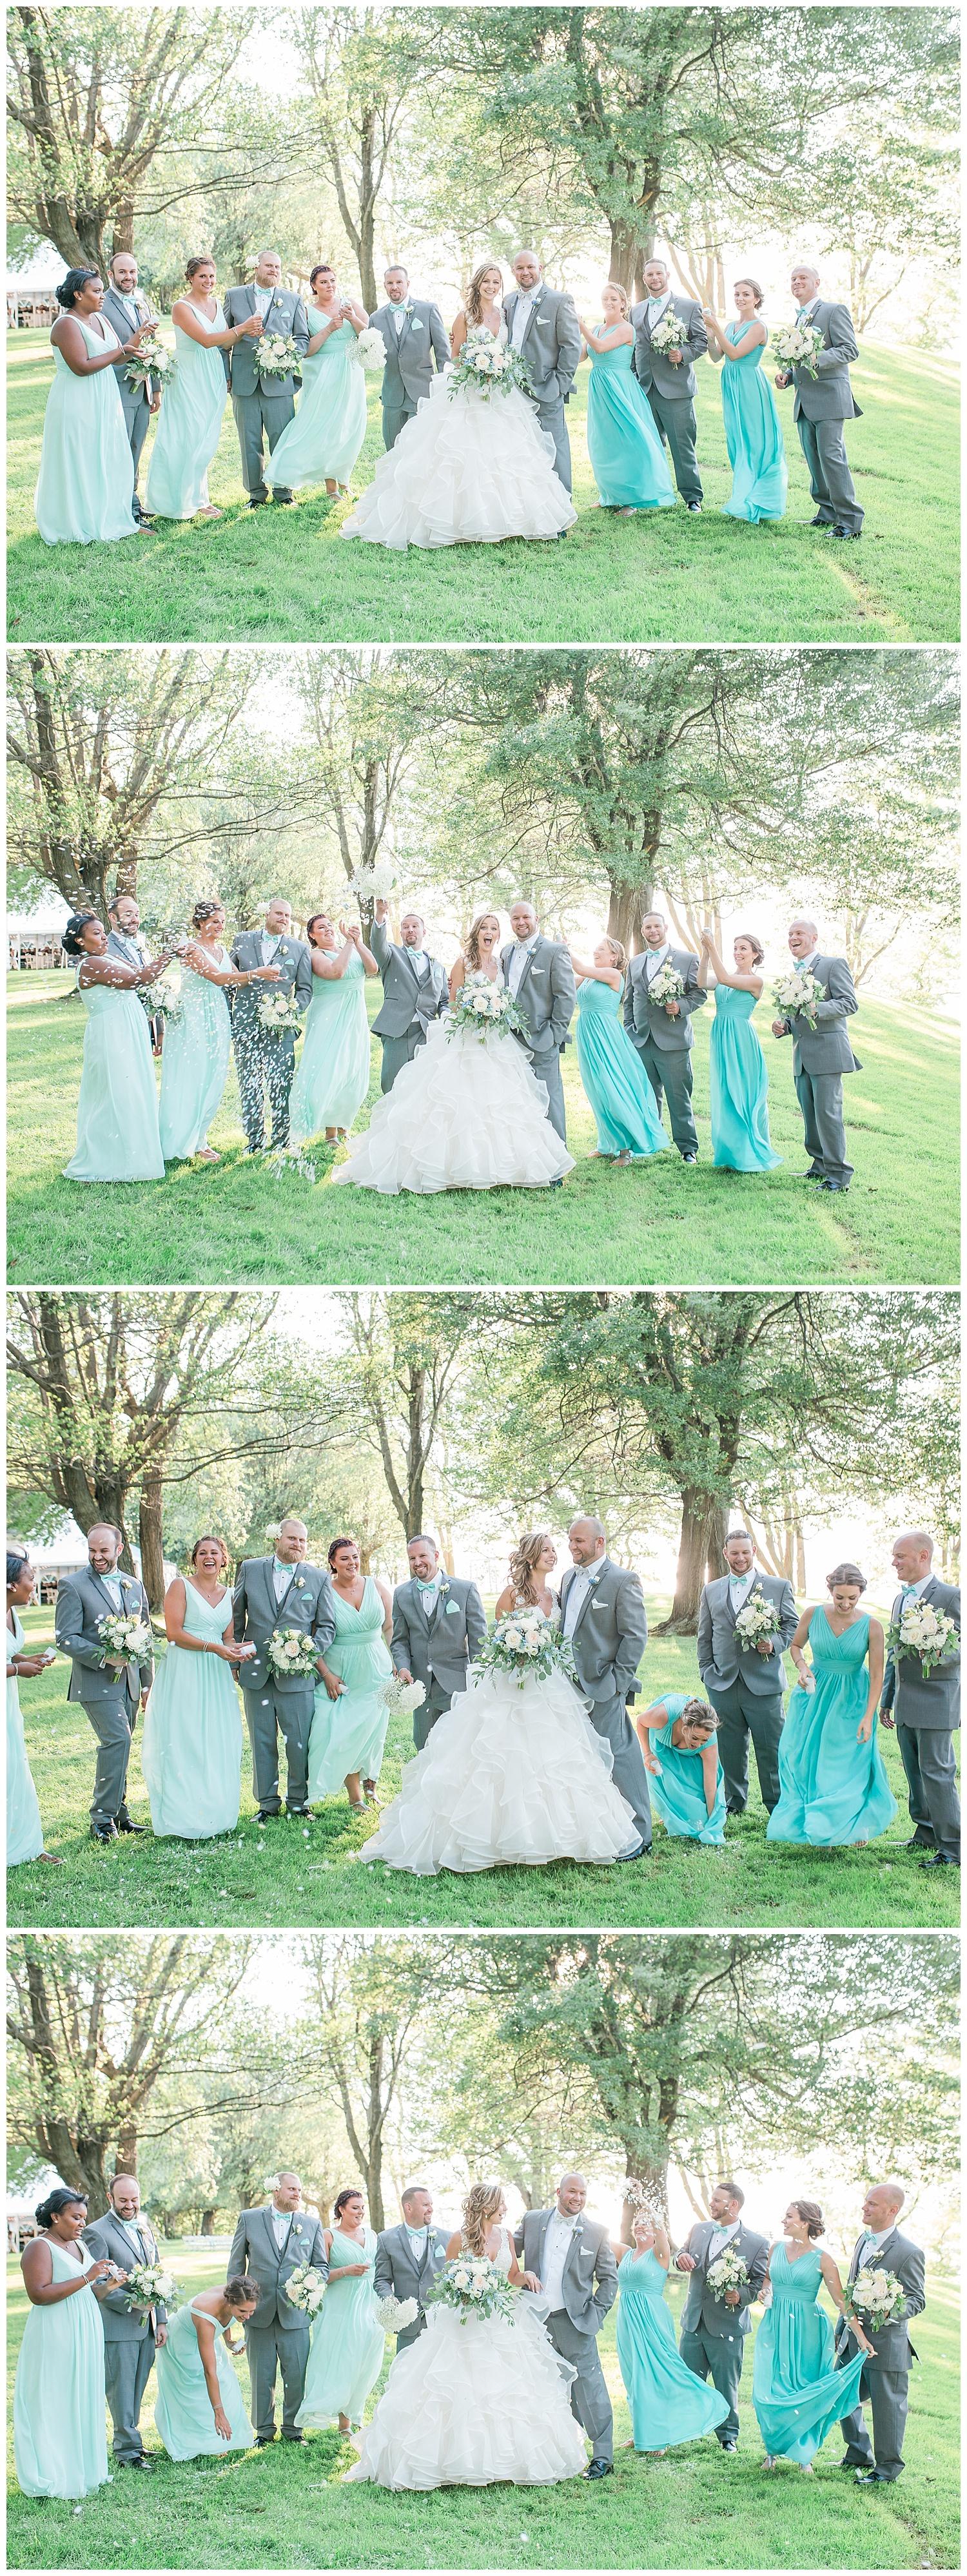 Sean and Andrea - Webster wedding - lass and beau-970_Buffalo wedding photography.jpg